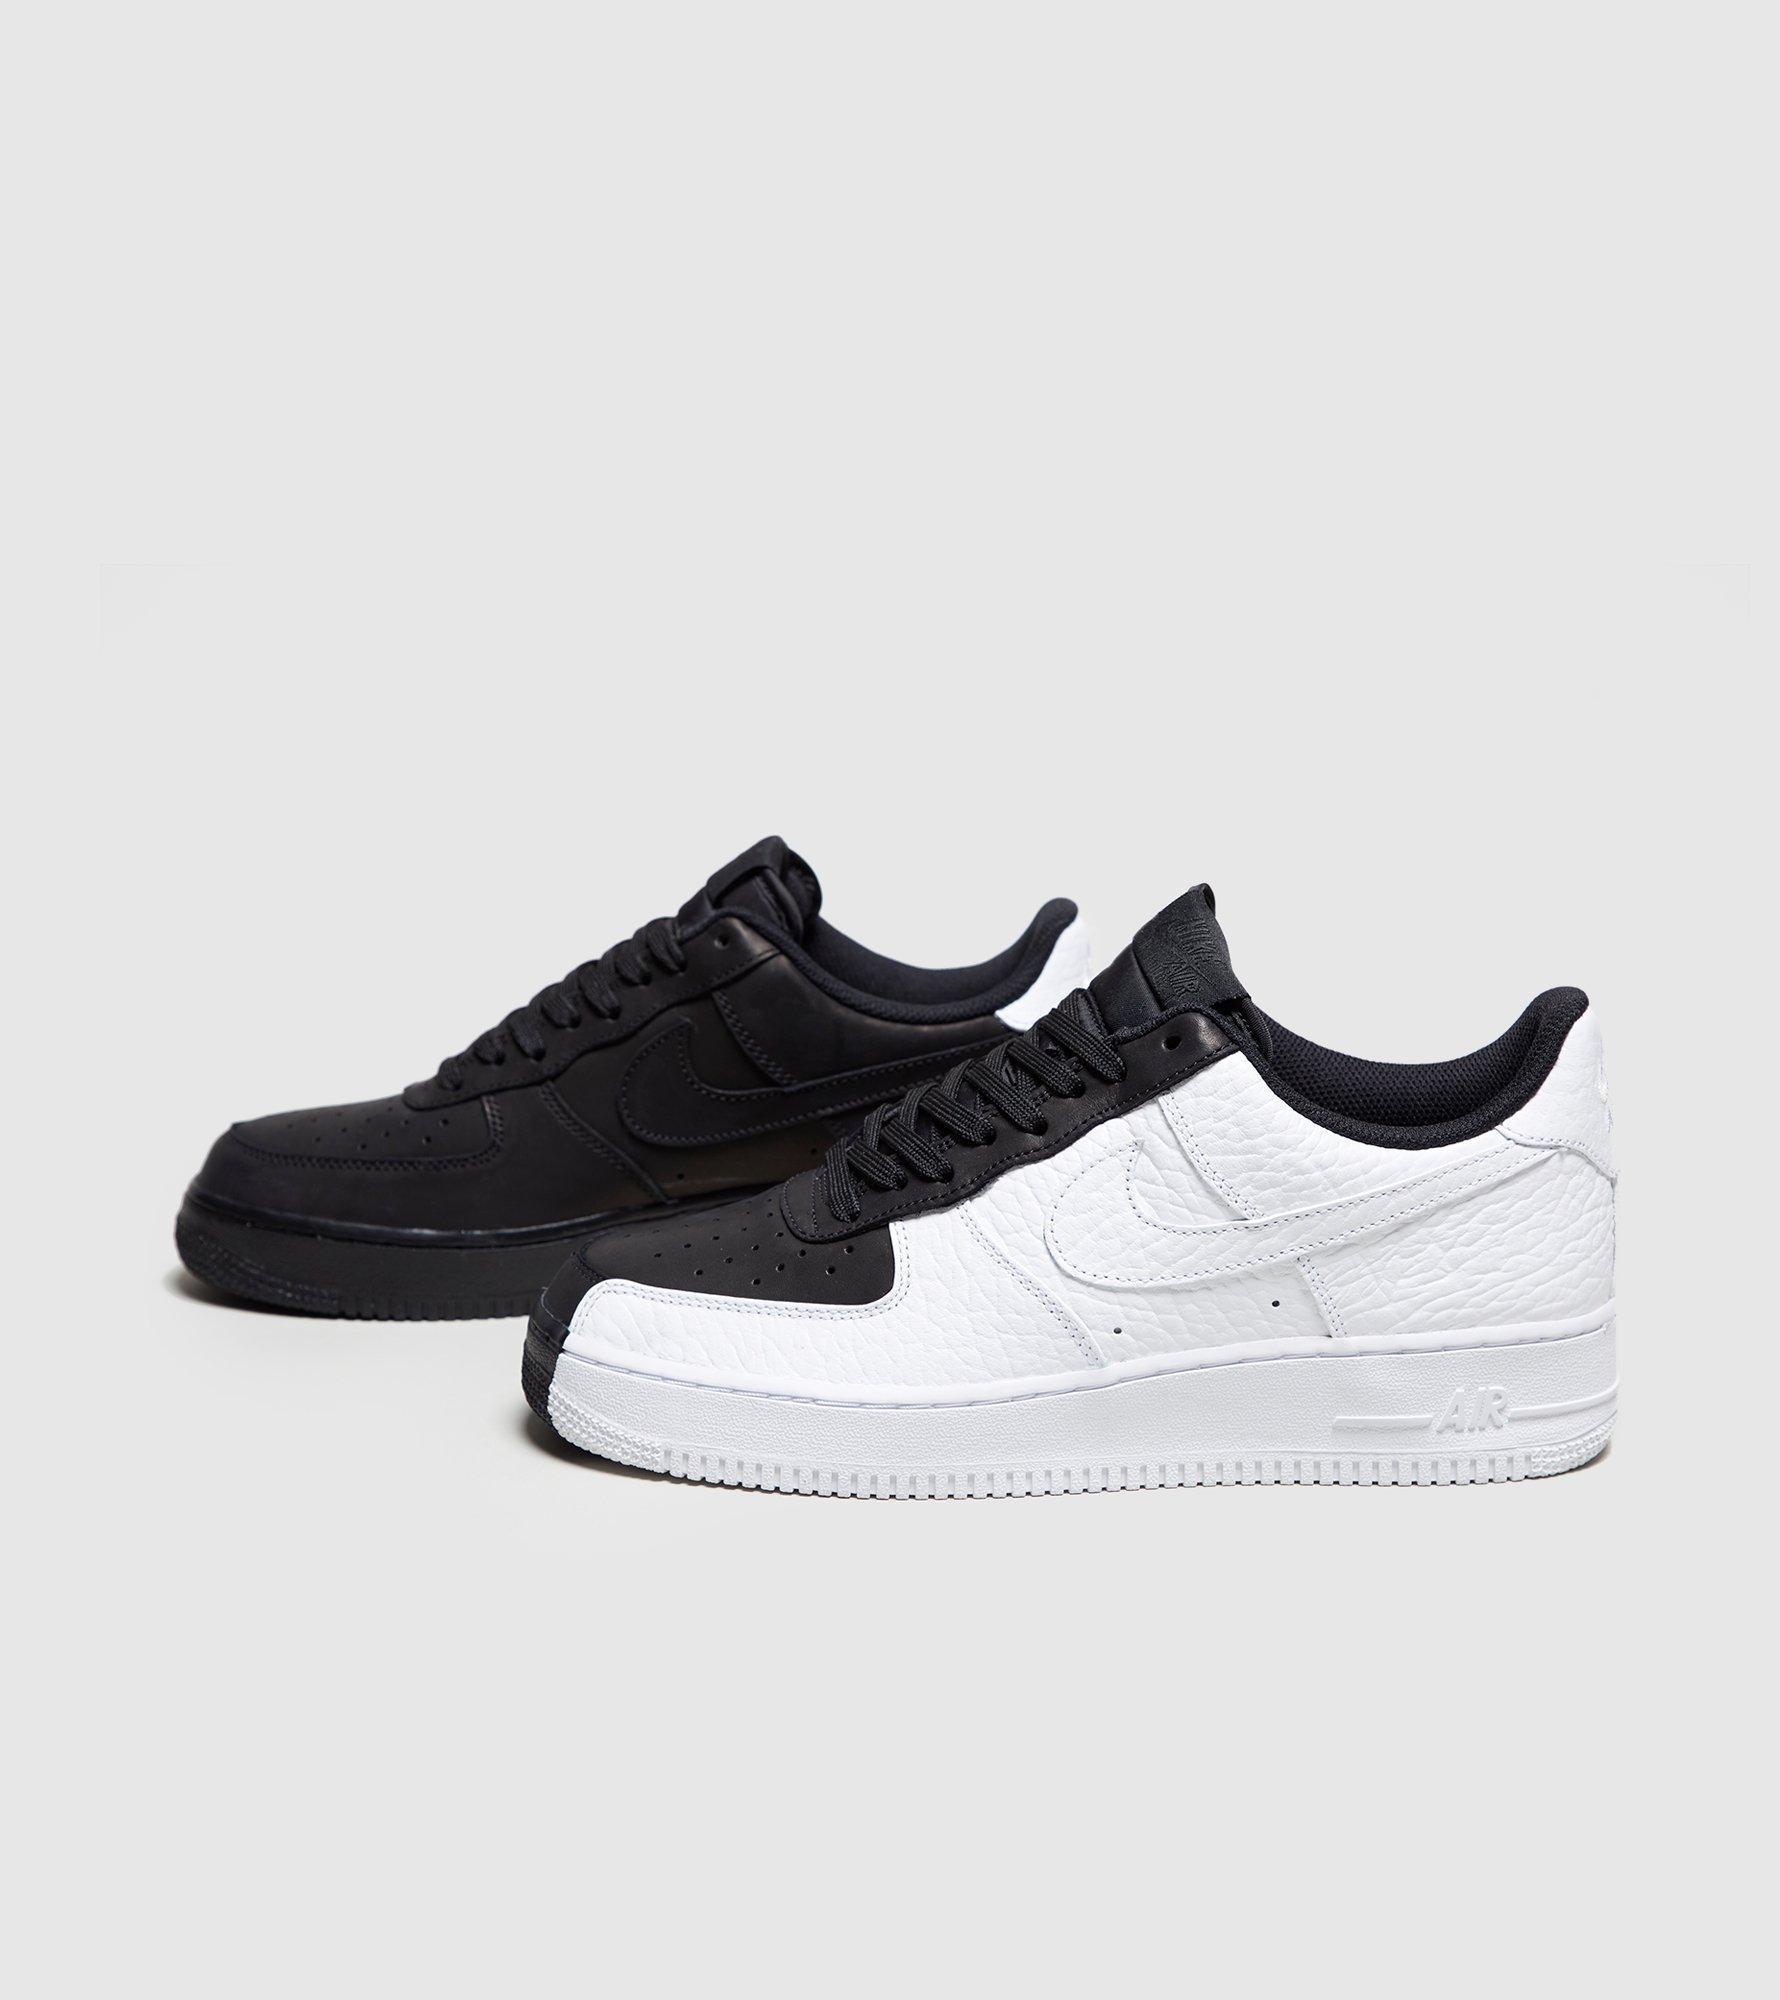 Lyst Nike Air Force 1 'split' in Black for Men